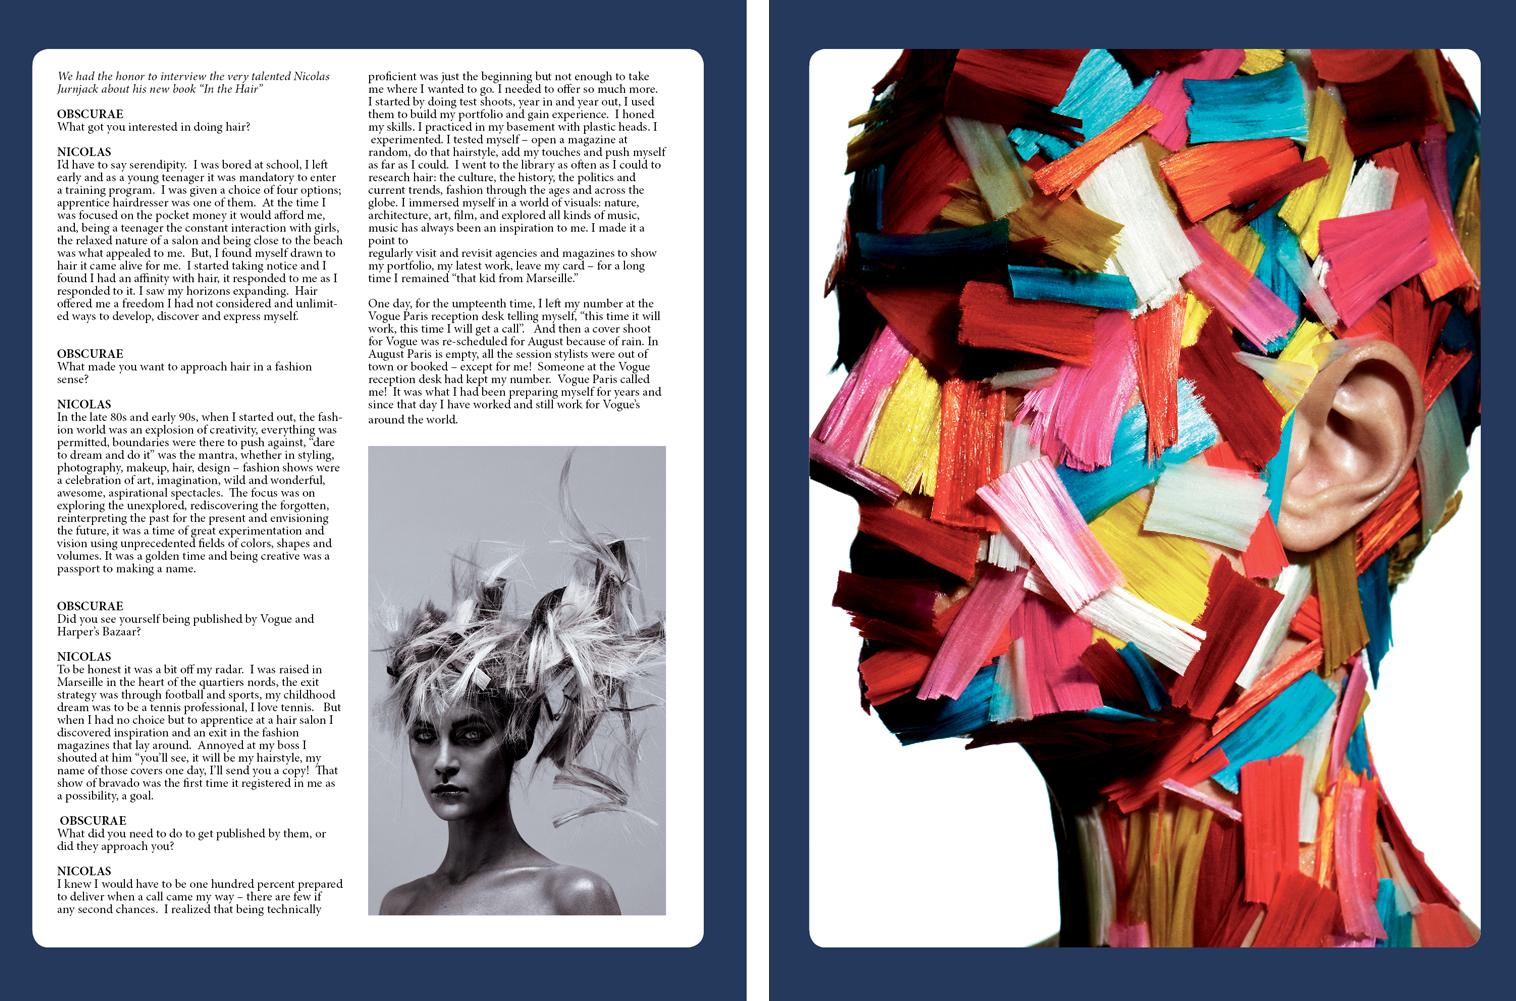 Obscurae Magazine - Nicolas Jurnjack -  Page 74-75